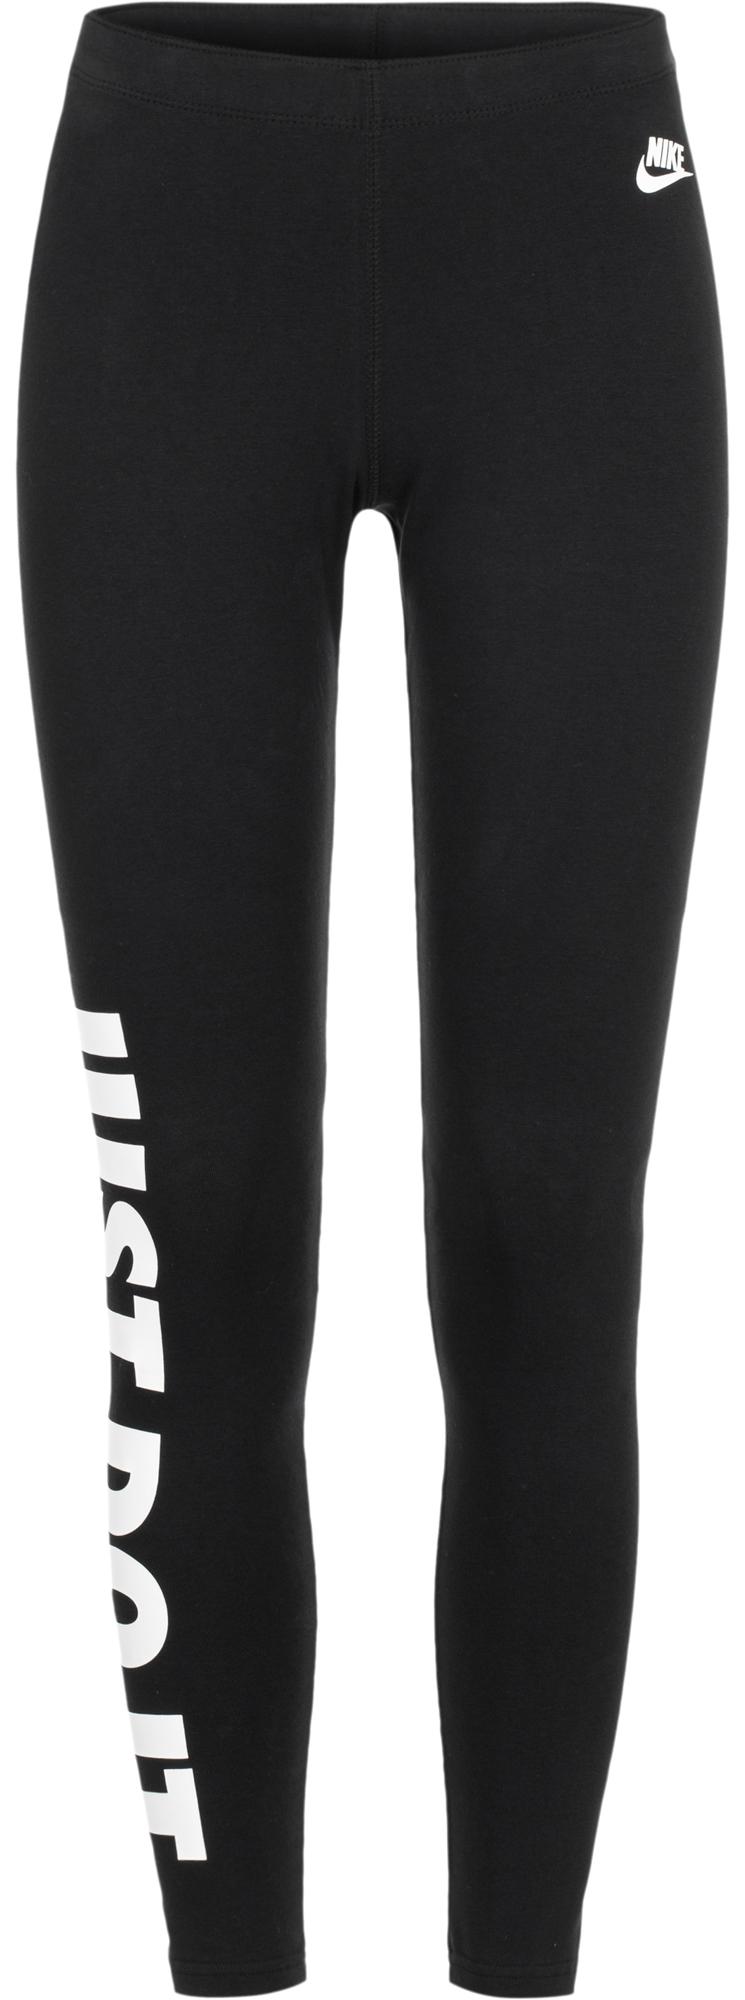 цена на Nike Легинсы женские Nike Sportswear, размер 42-44